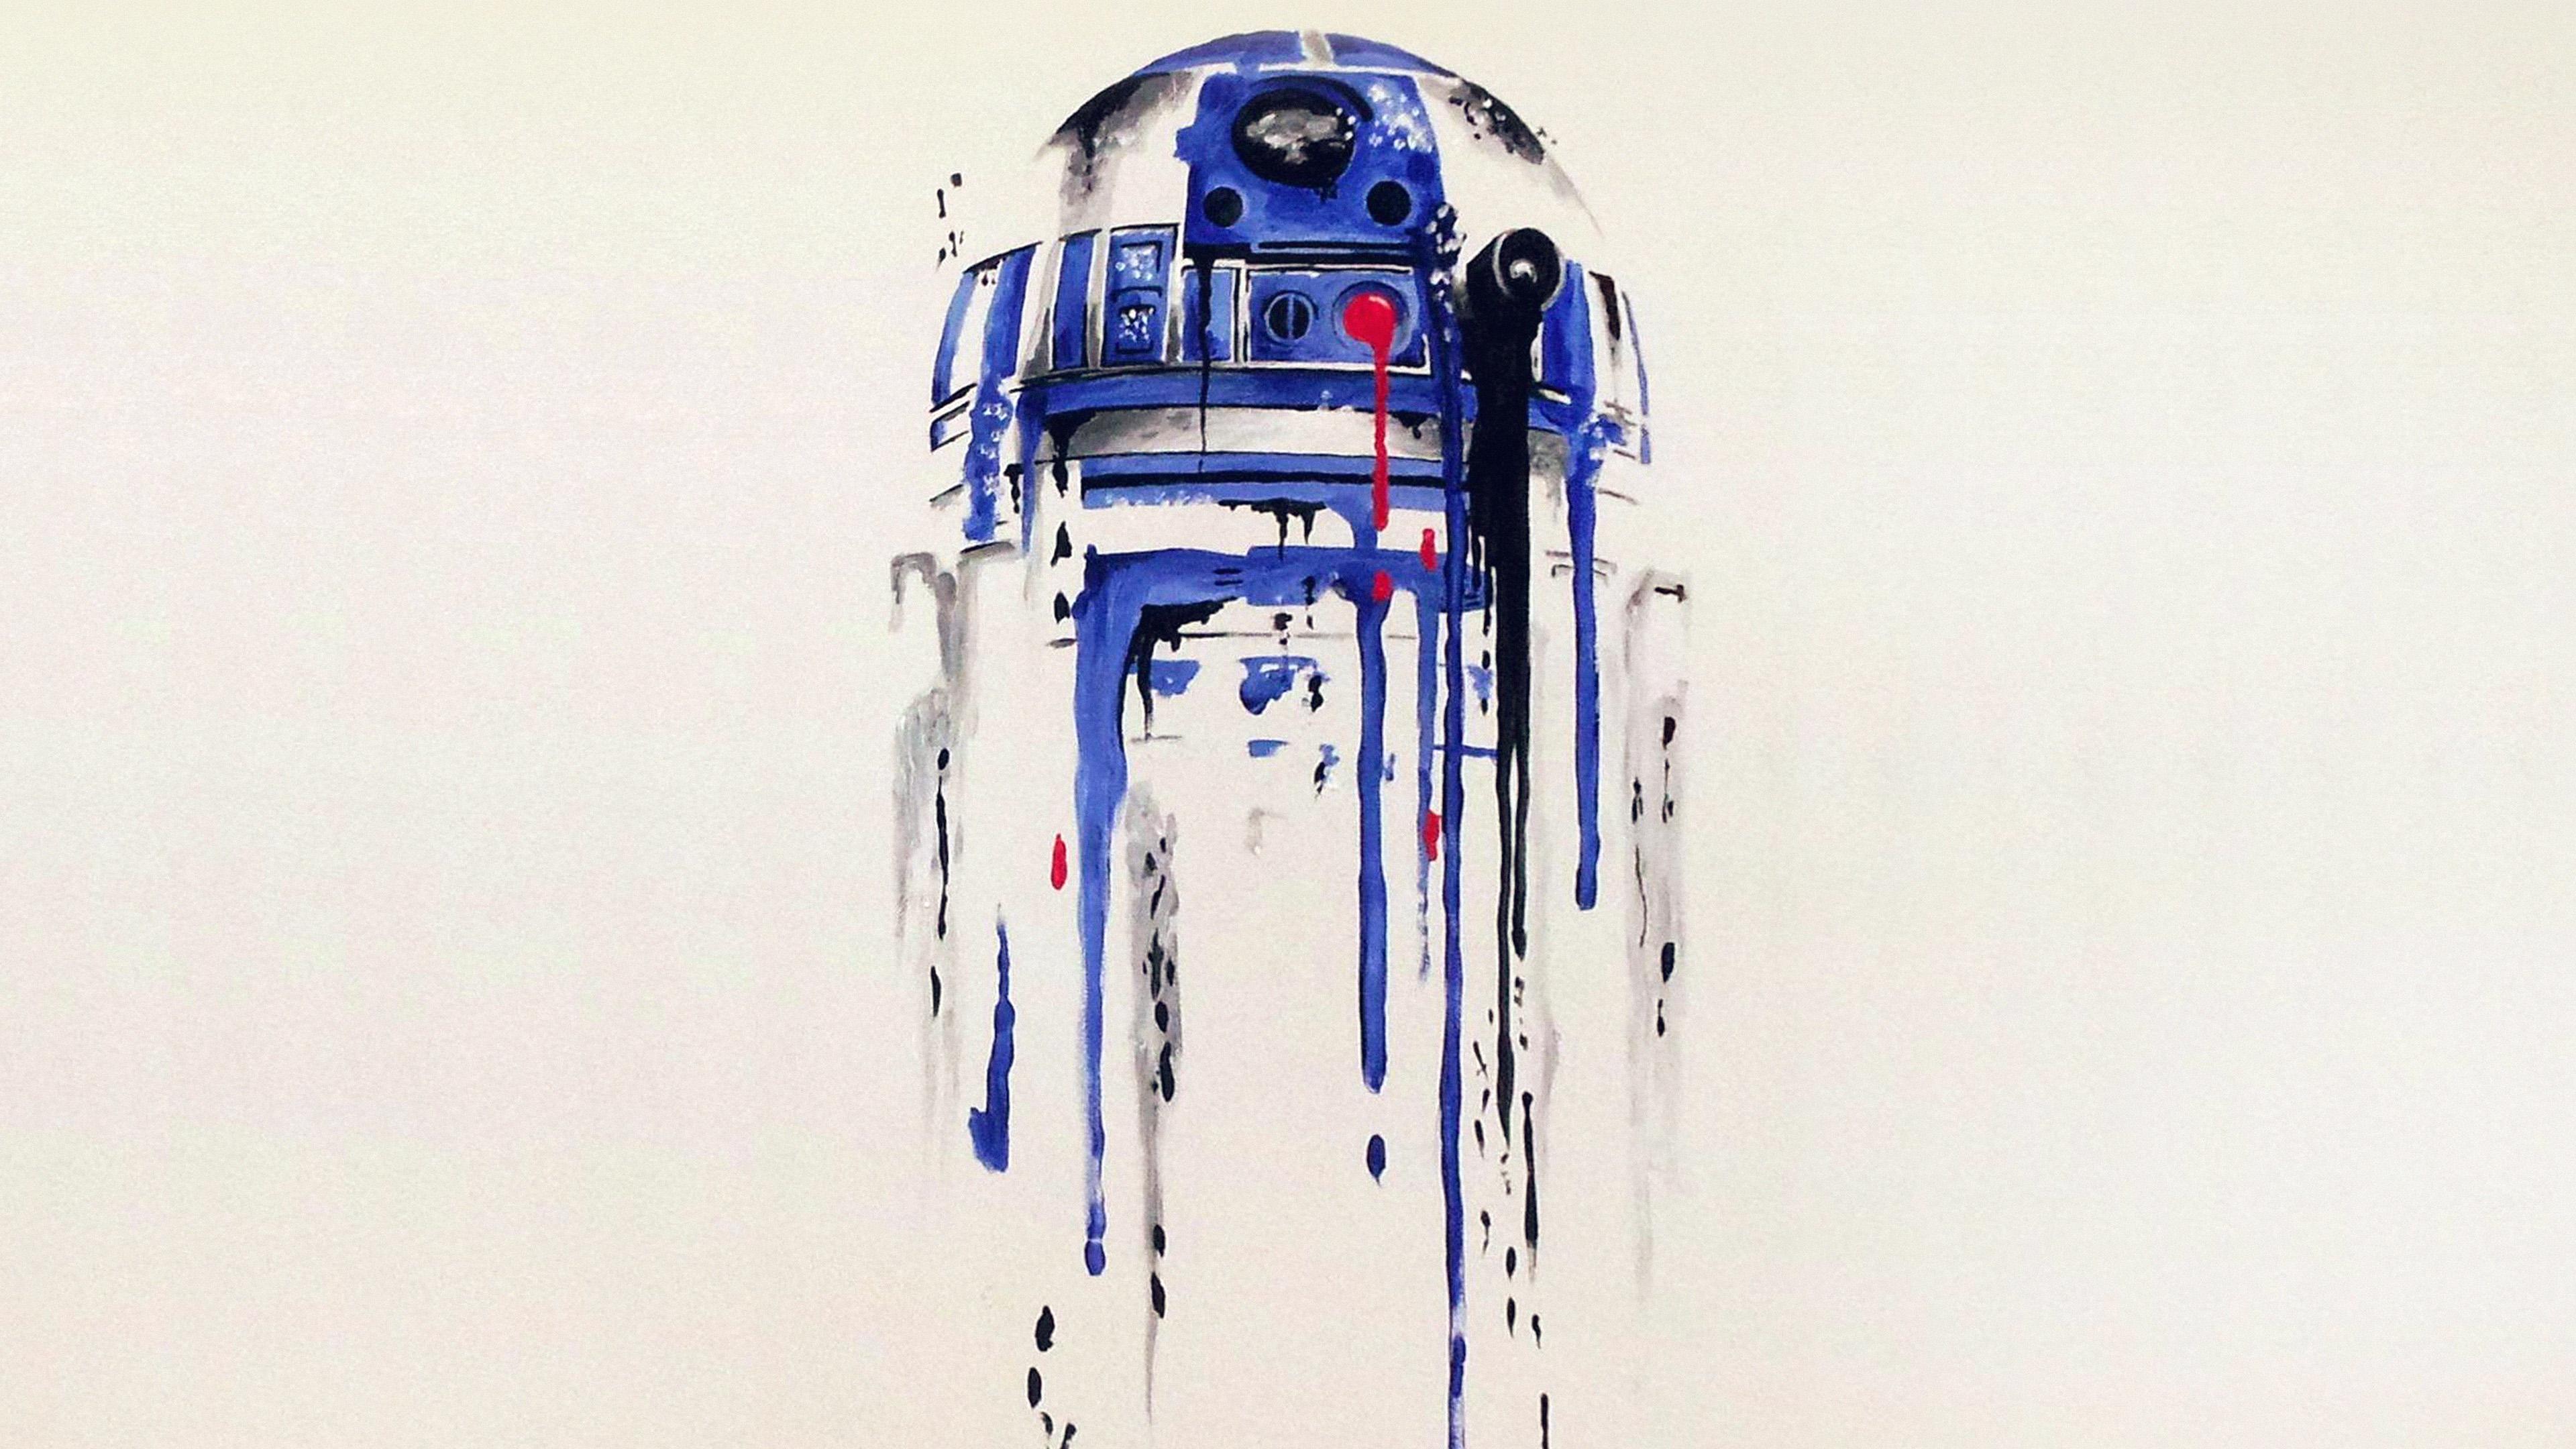 As07 R2 D2 Minimal Painting Starwars Art Illustration Wallpaper